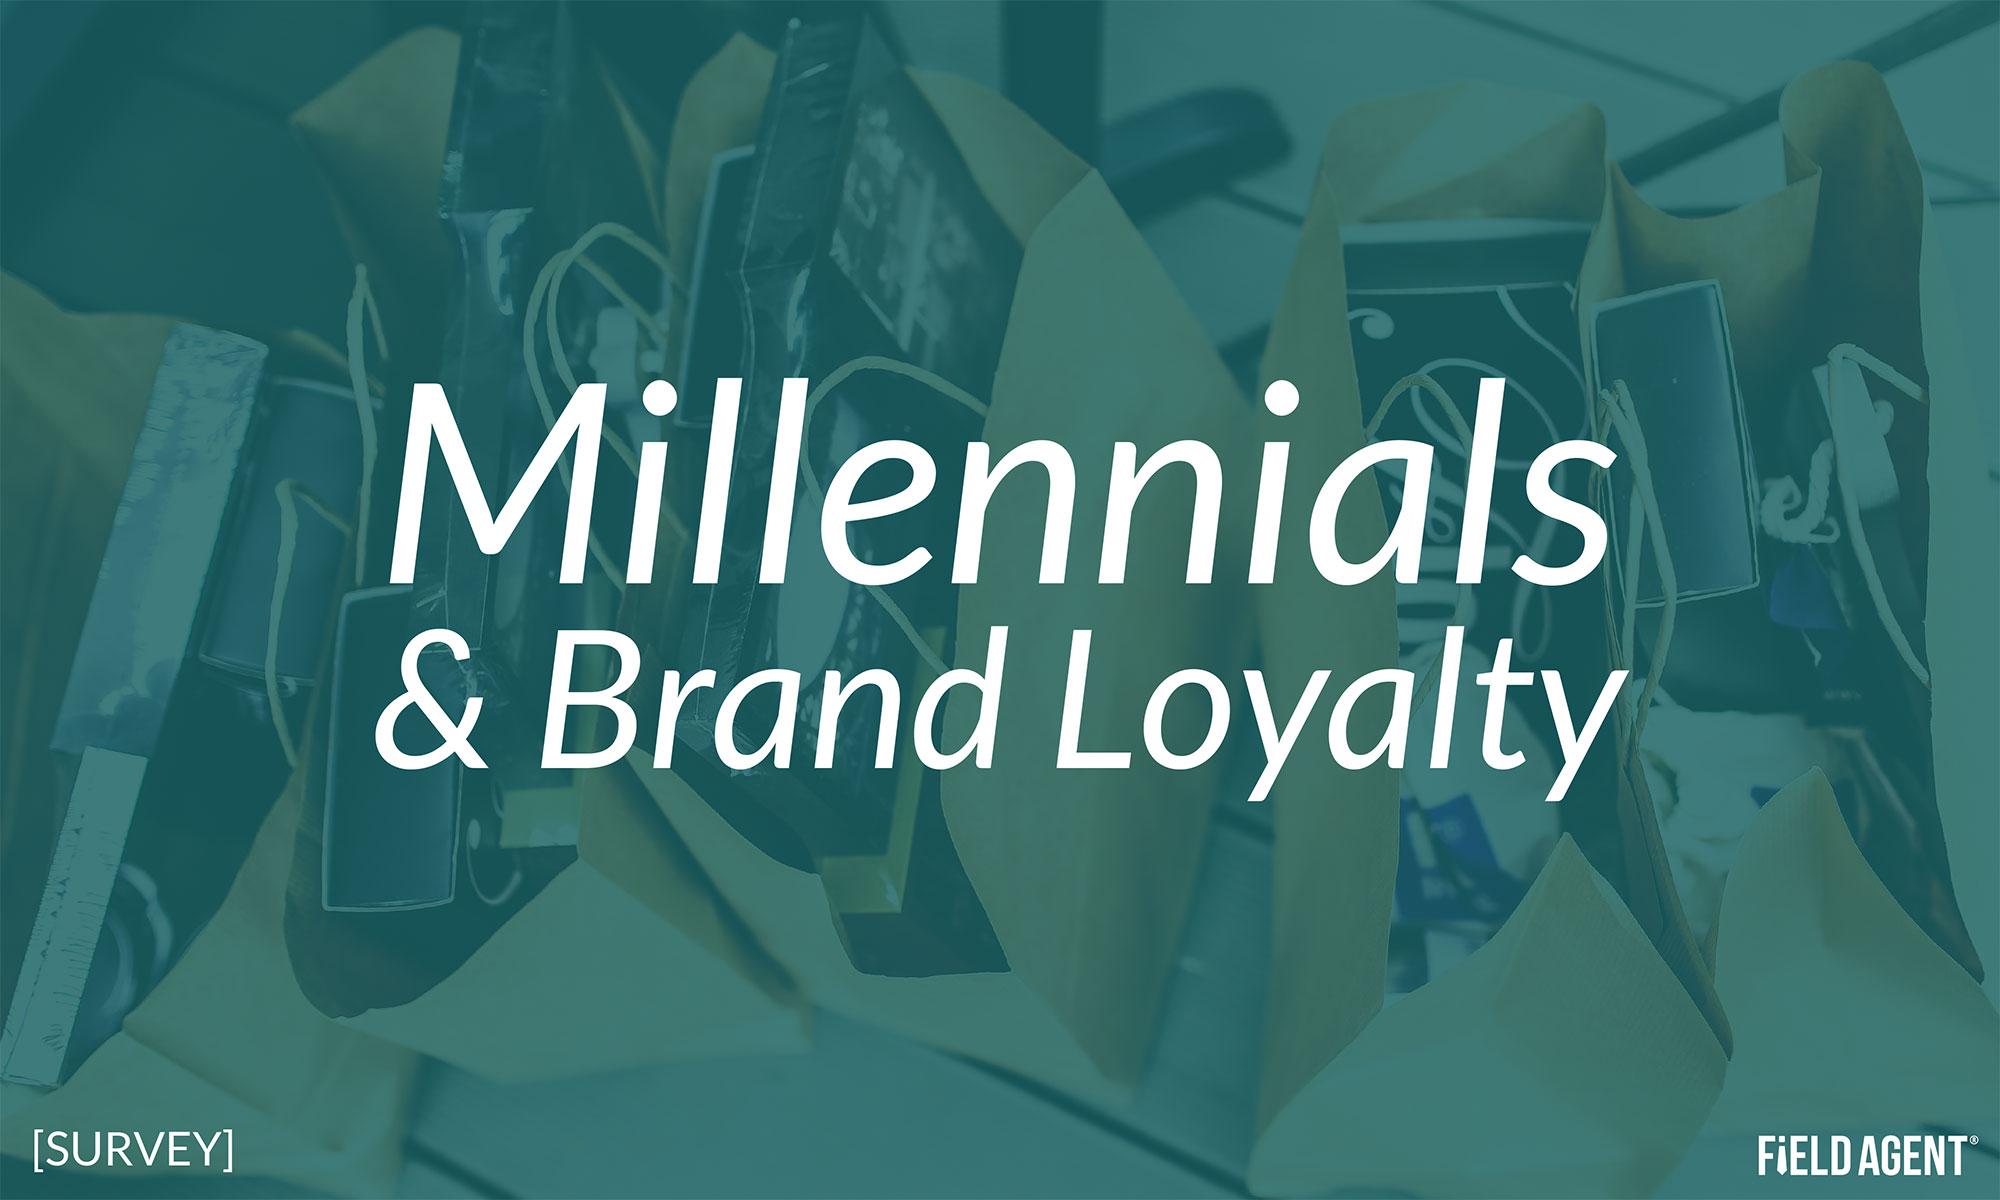 Millennials and Brand Loyalty: A Survey